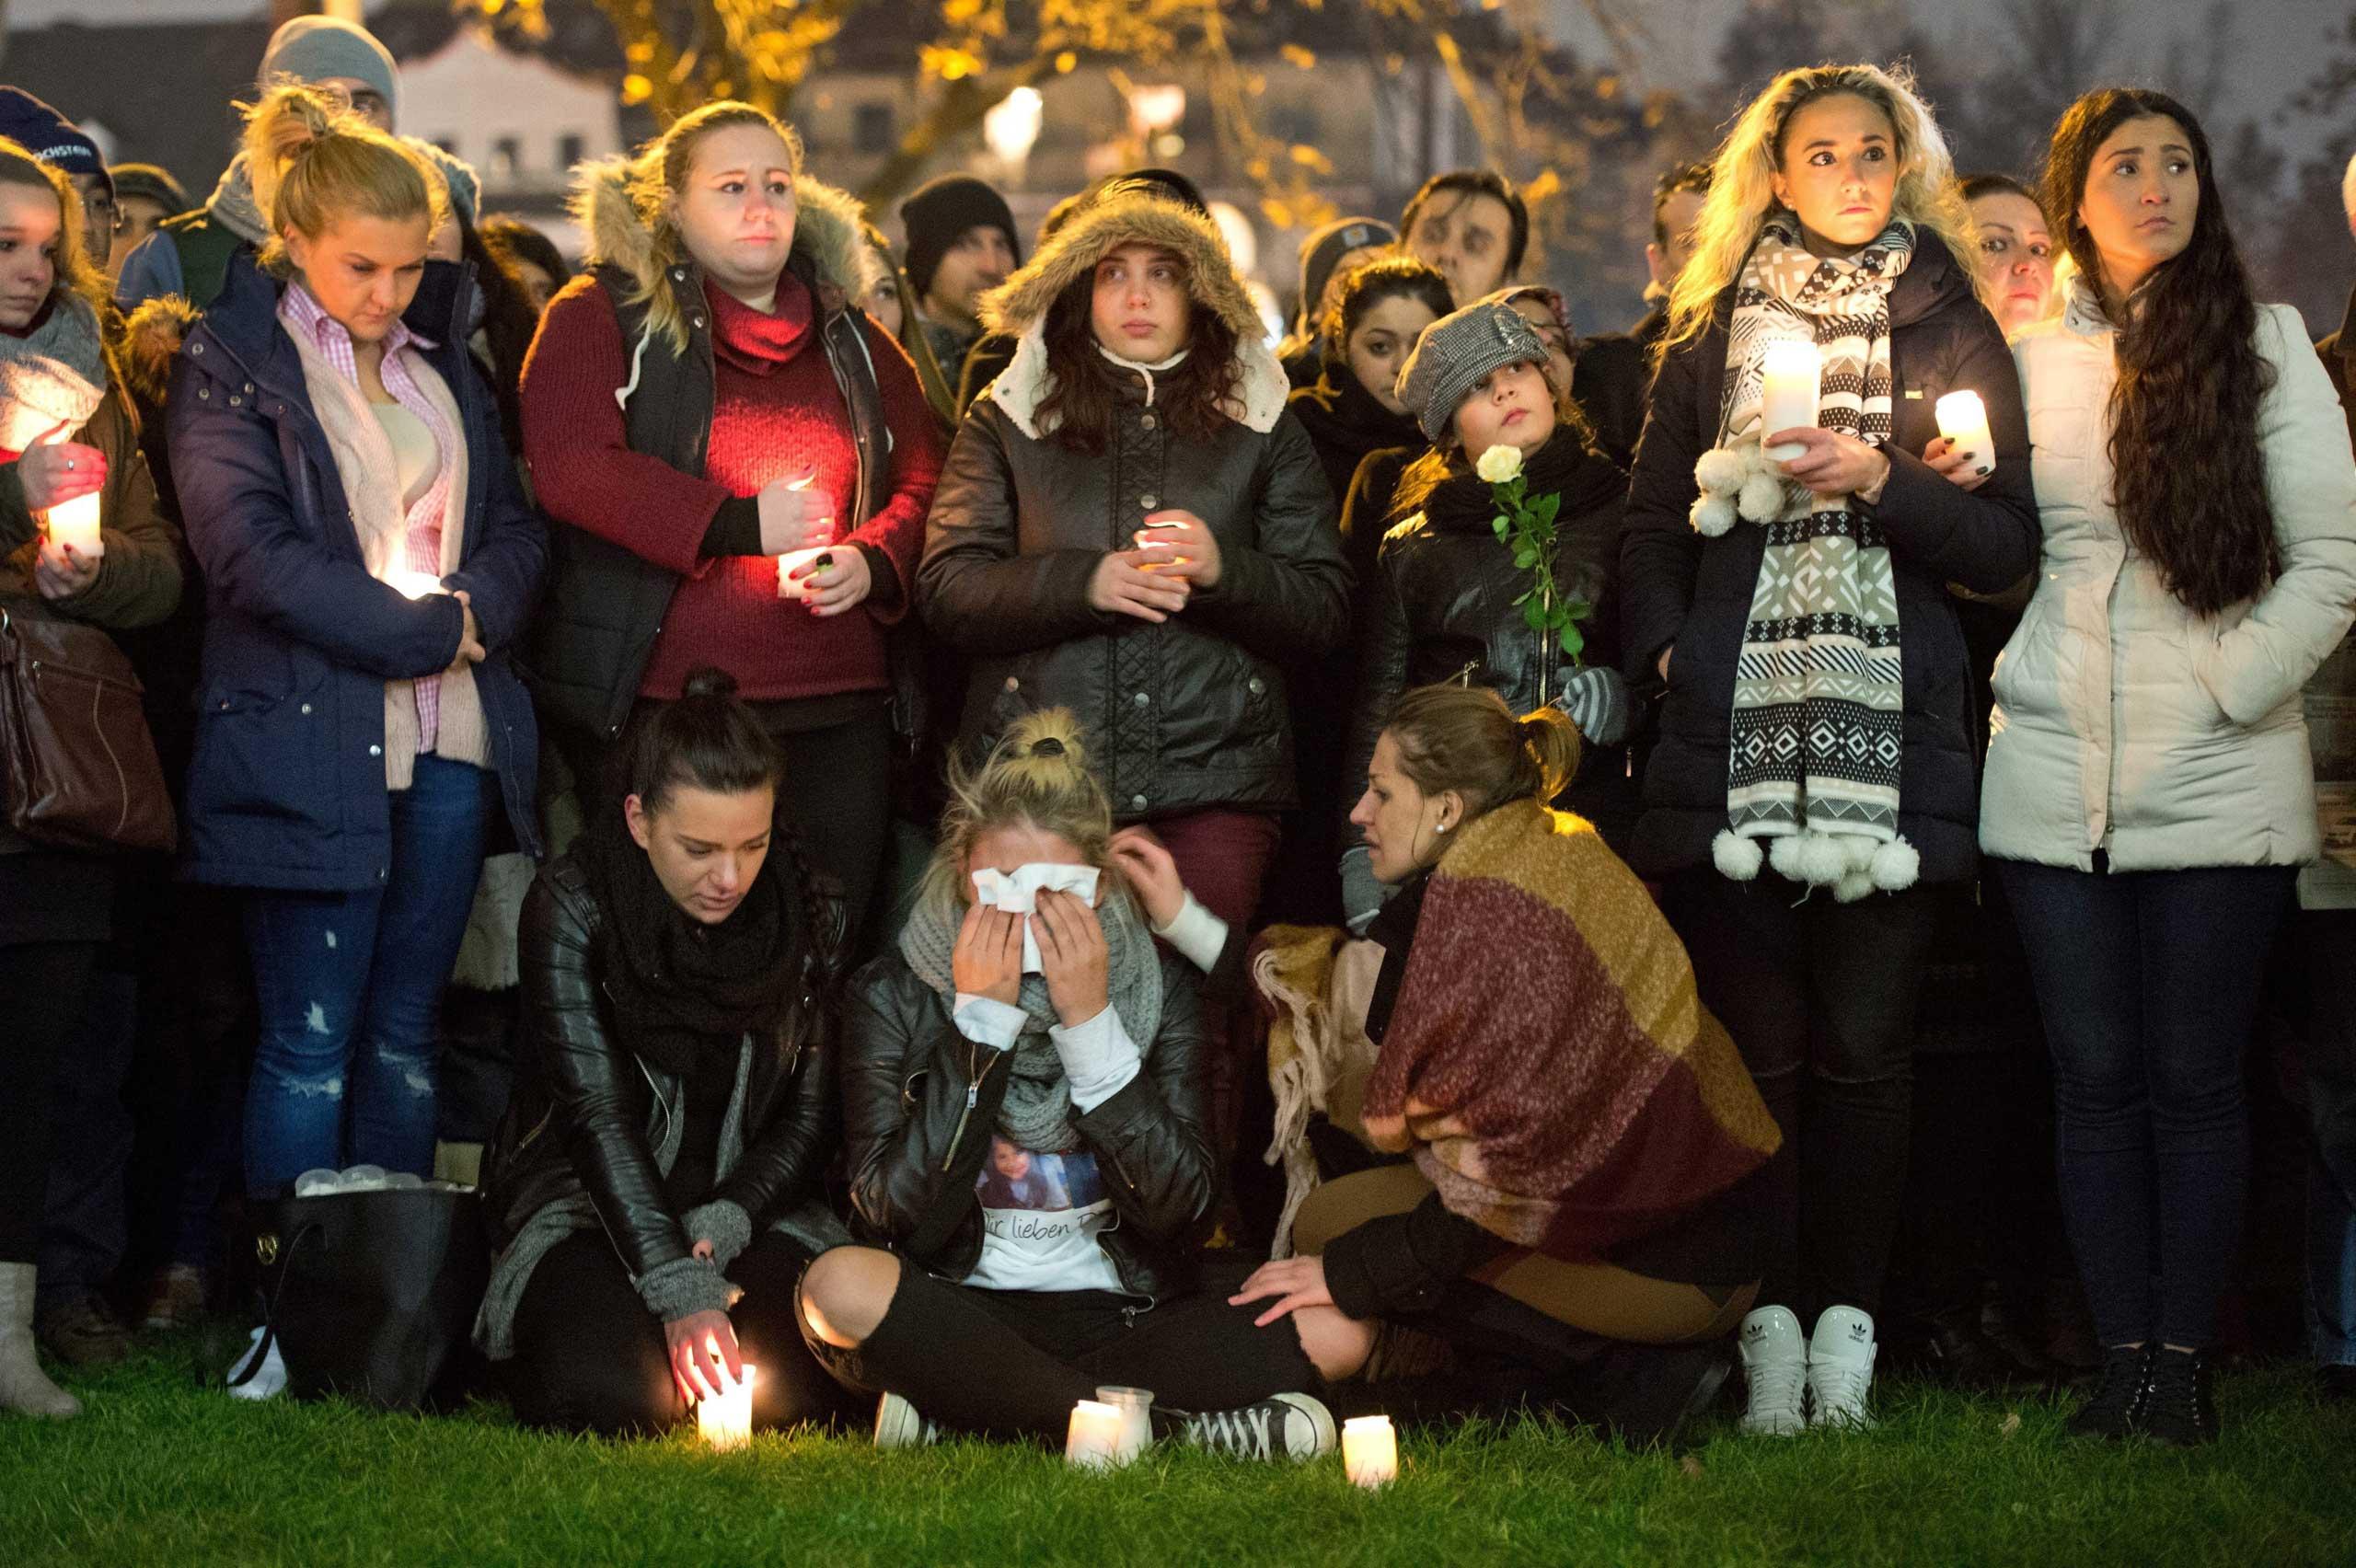 Vigil outside the hospital that treated Tugce Albayrak in Offenbach am Mein, Germany, Nov. 28, 2014.